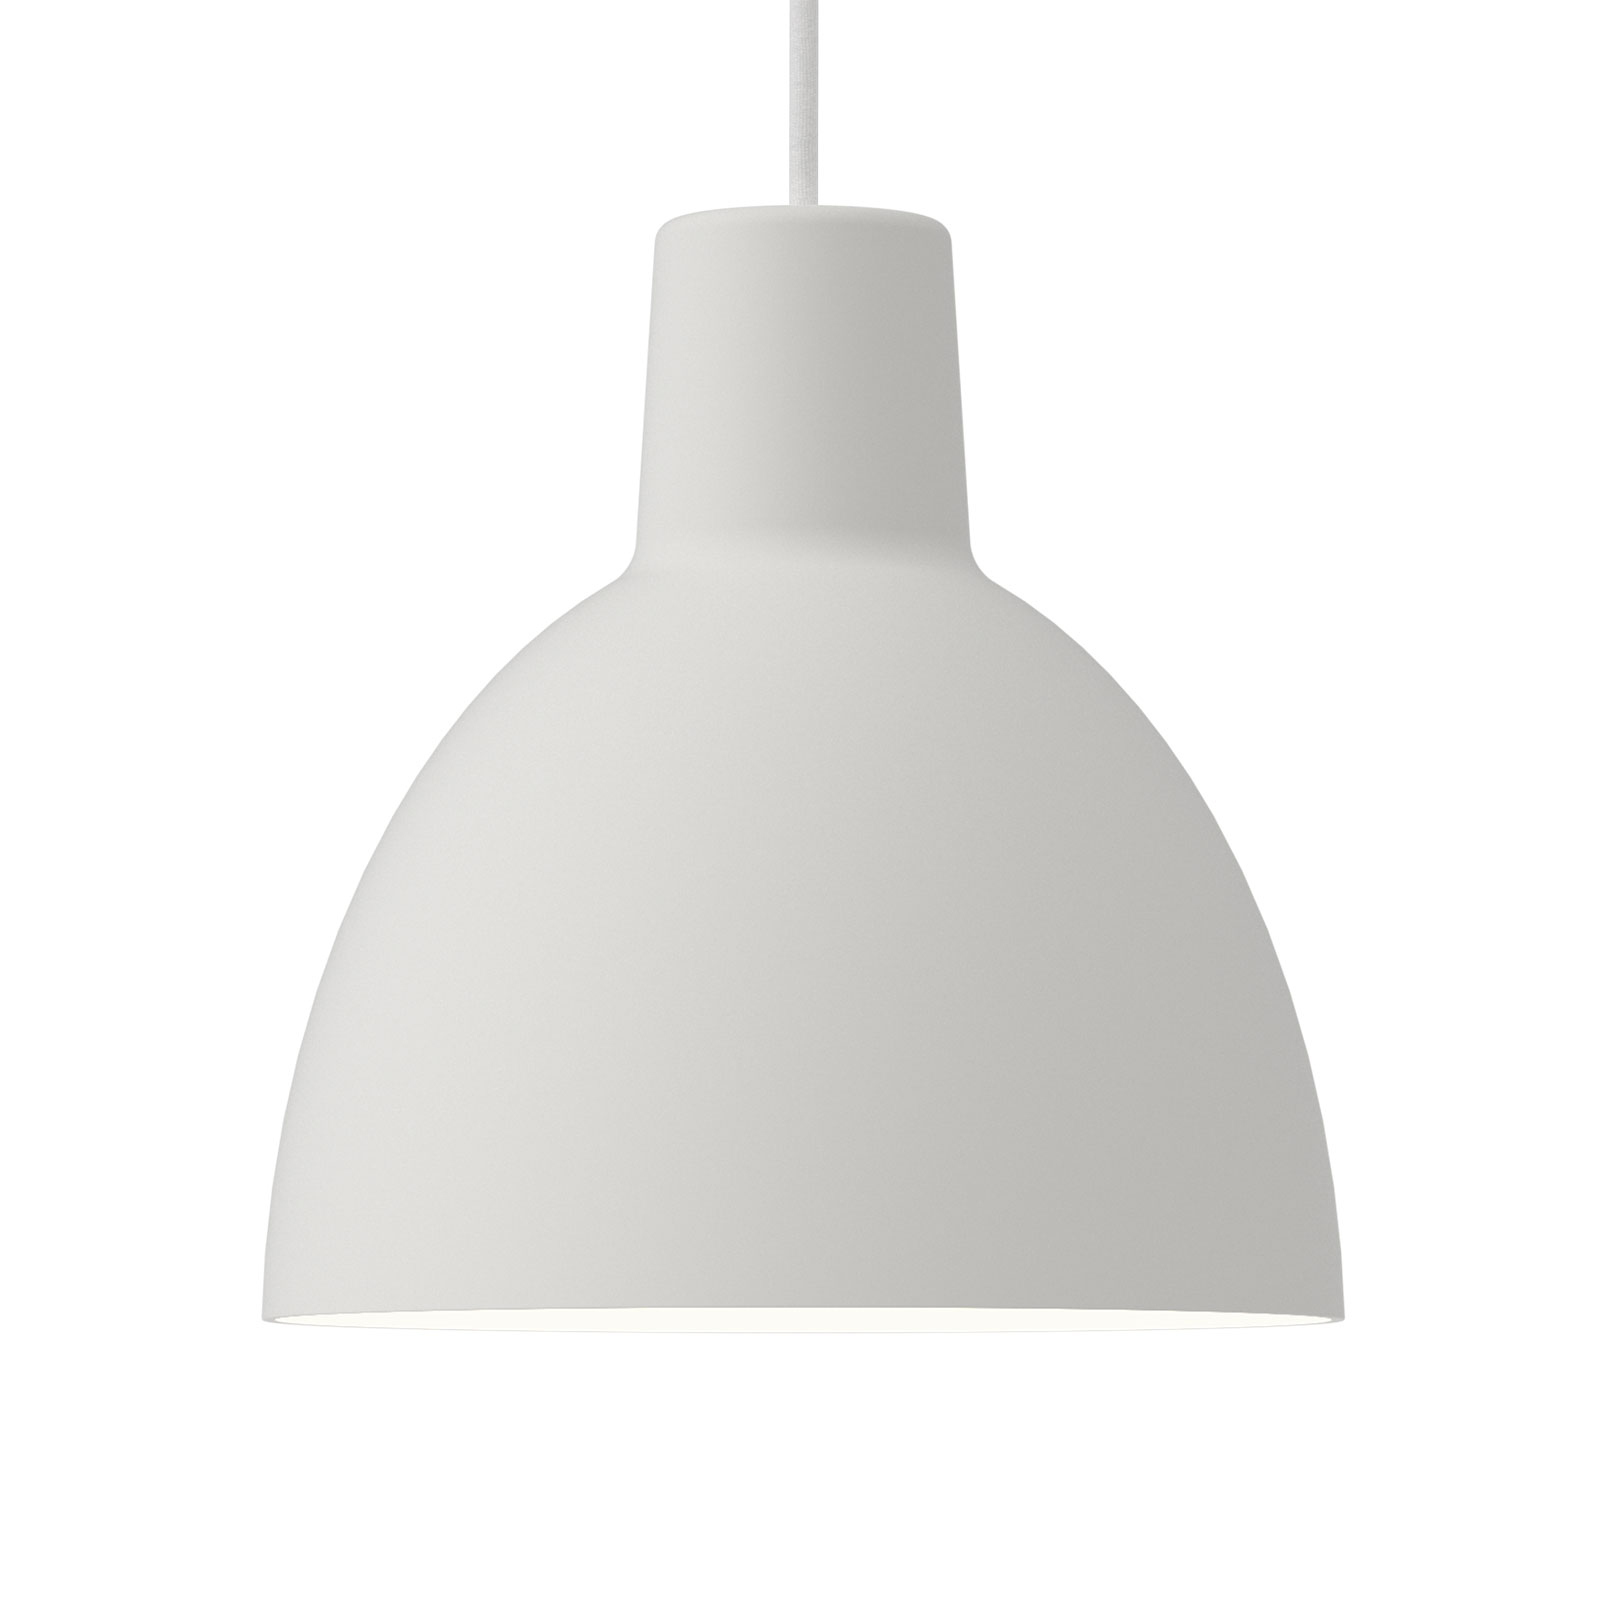 Louis Poulsen hanglamp Toldbod 250 wit